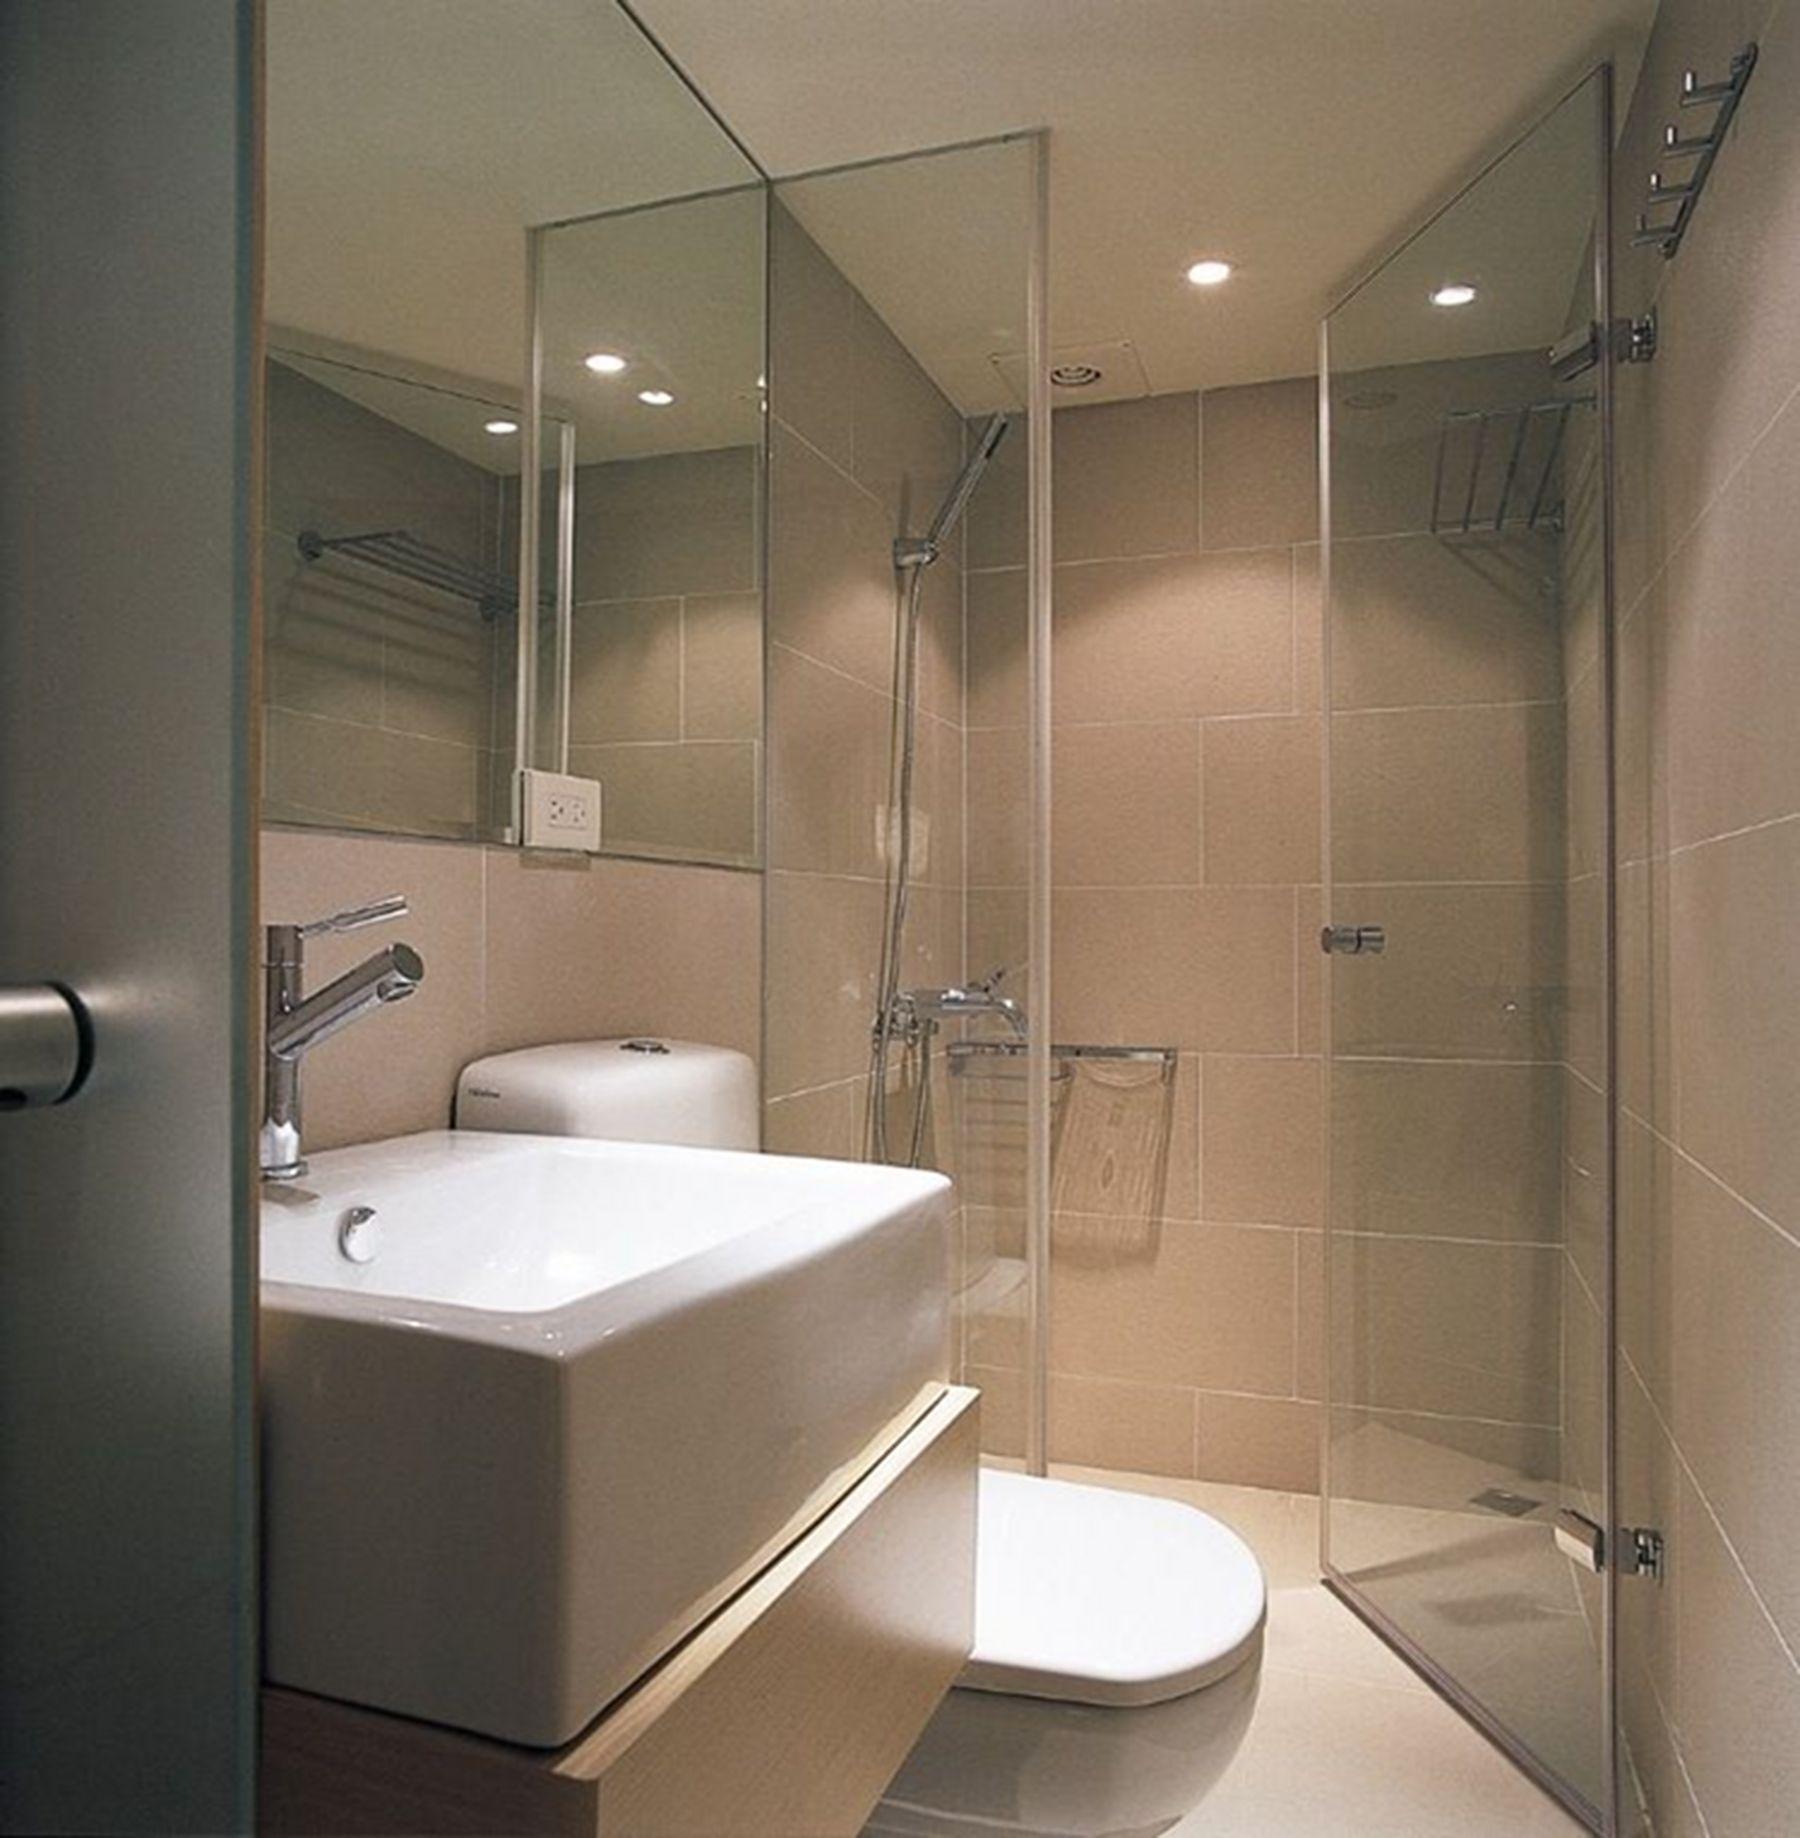 15 Stunning Small Bathroom Design Idea For The Limitations